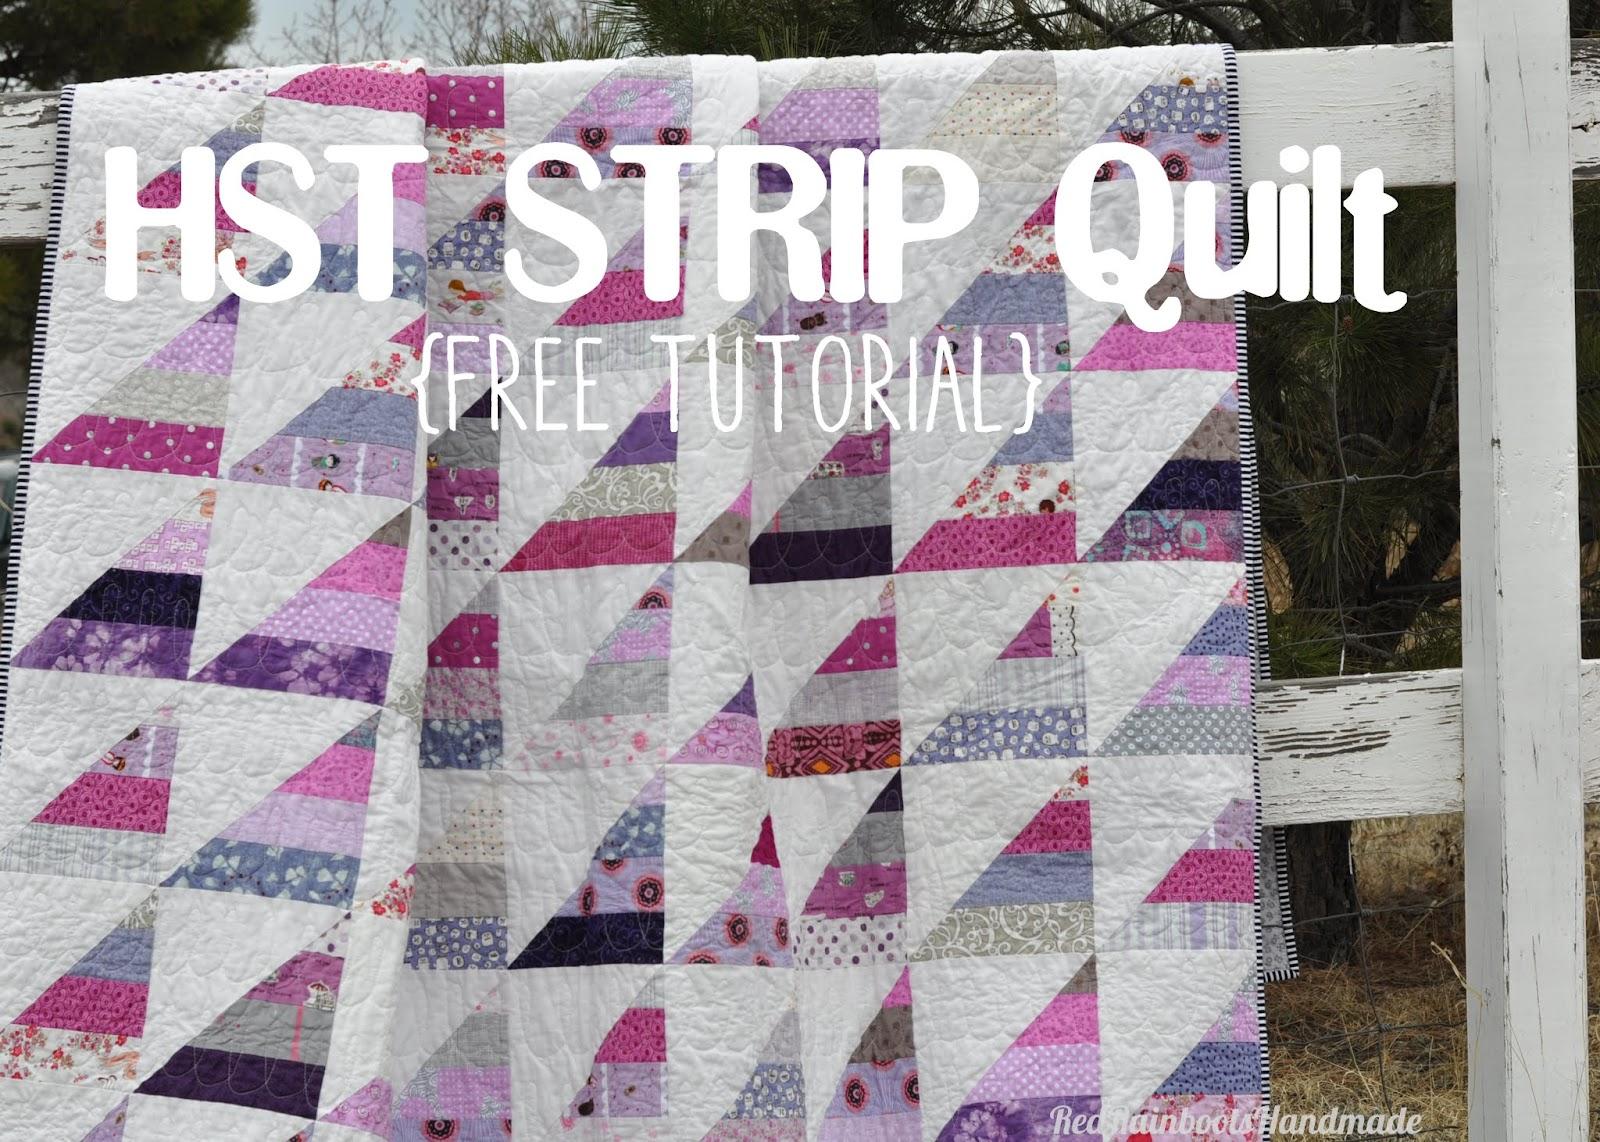 http://redrainbootshandmade.blogspot.com/2015/04/easy-hst-strip-quilt-tutorial.html